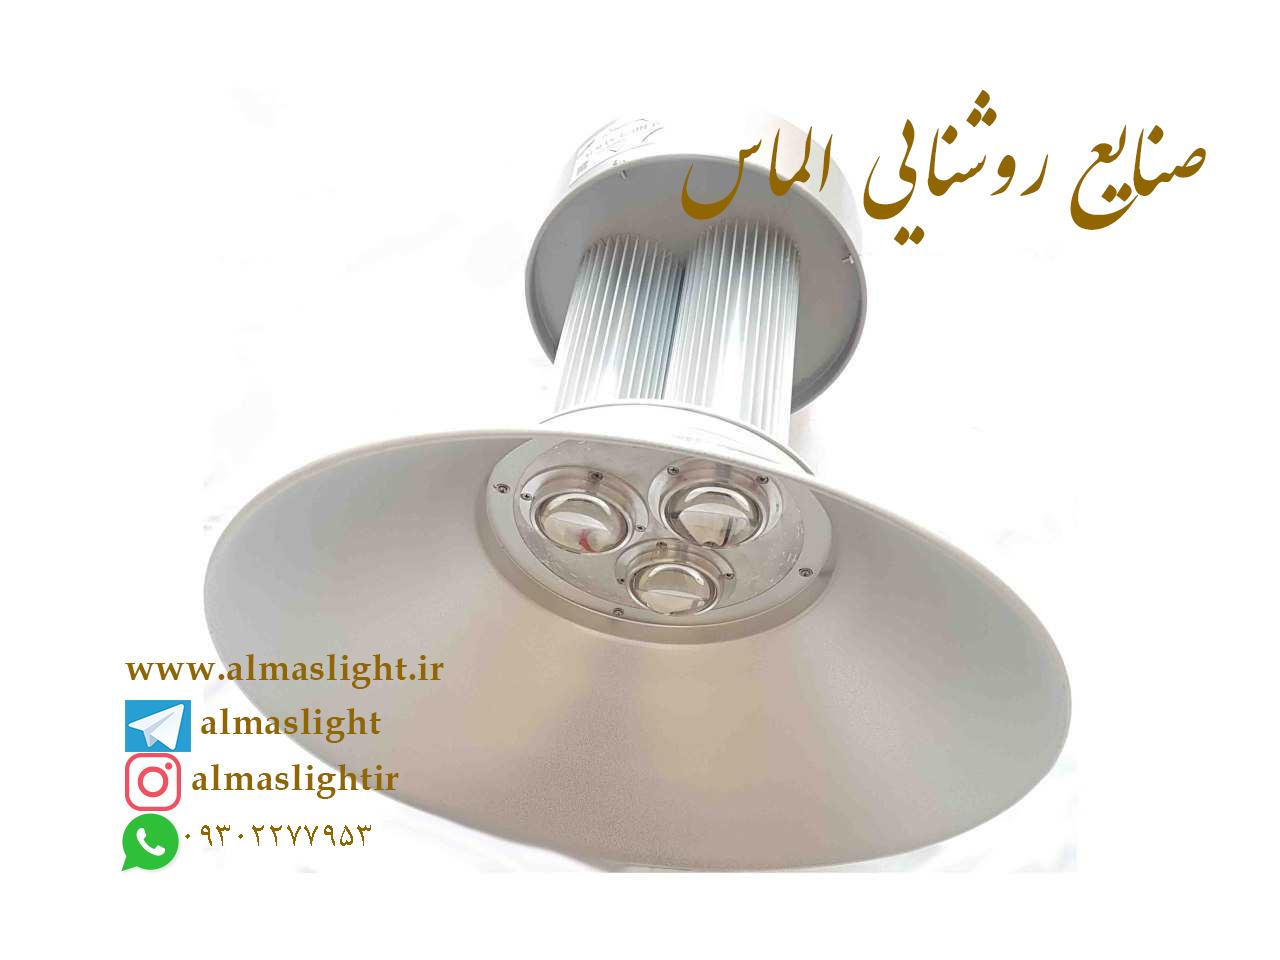 پرژکتور کارگاهی (سوله ای) صنایع روشنایی الماس لایت